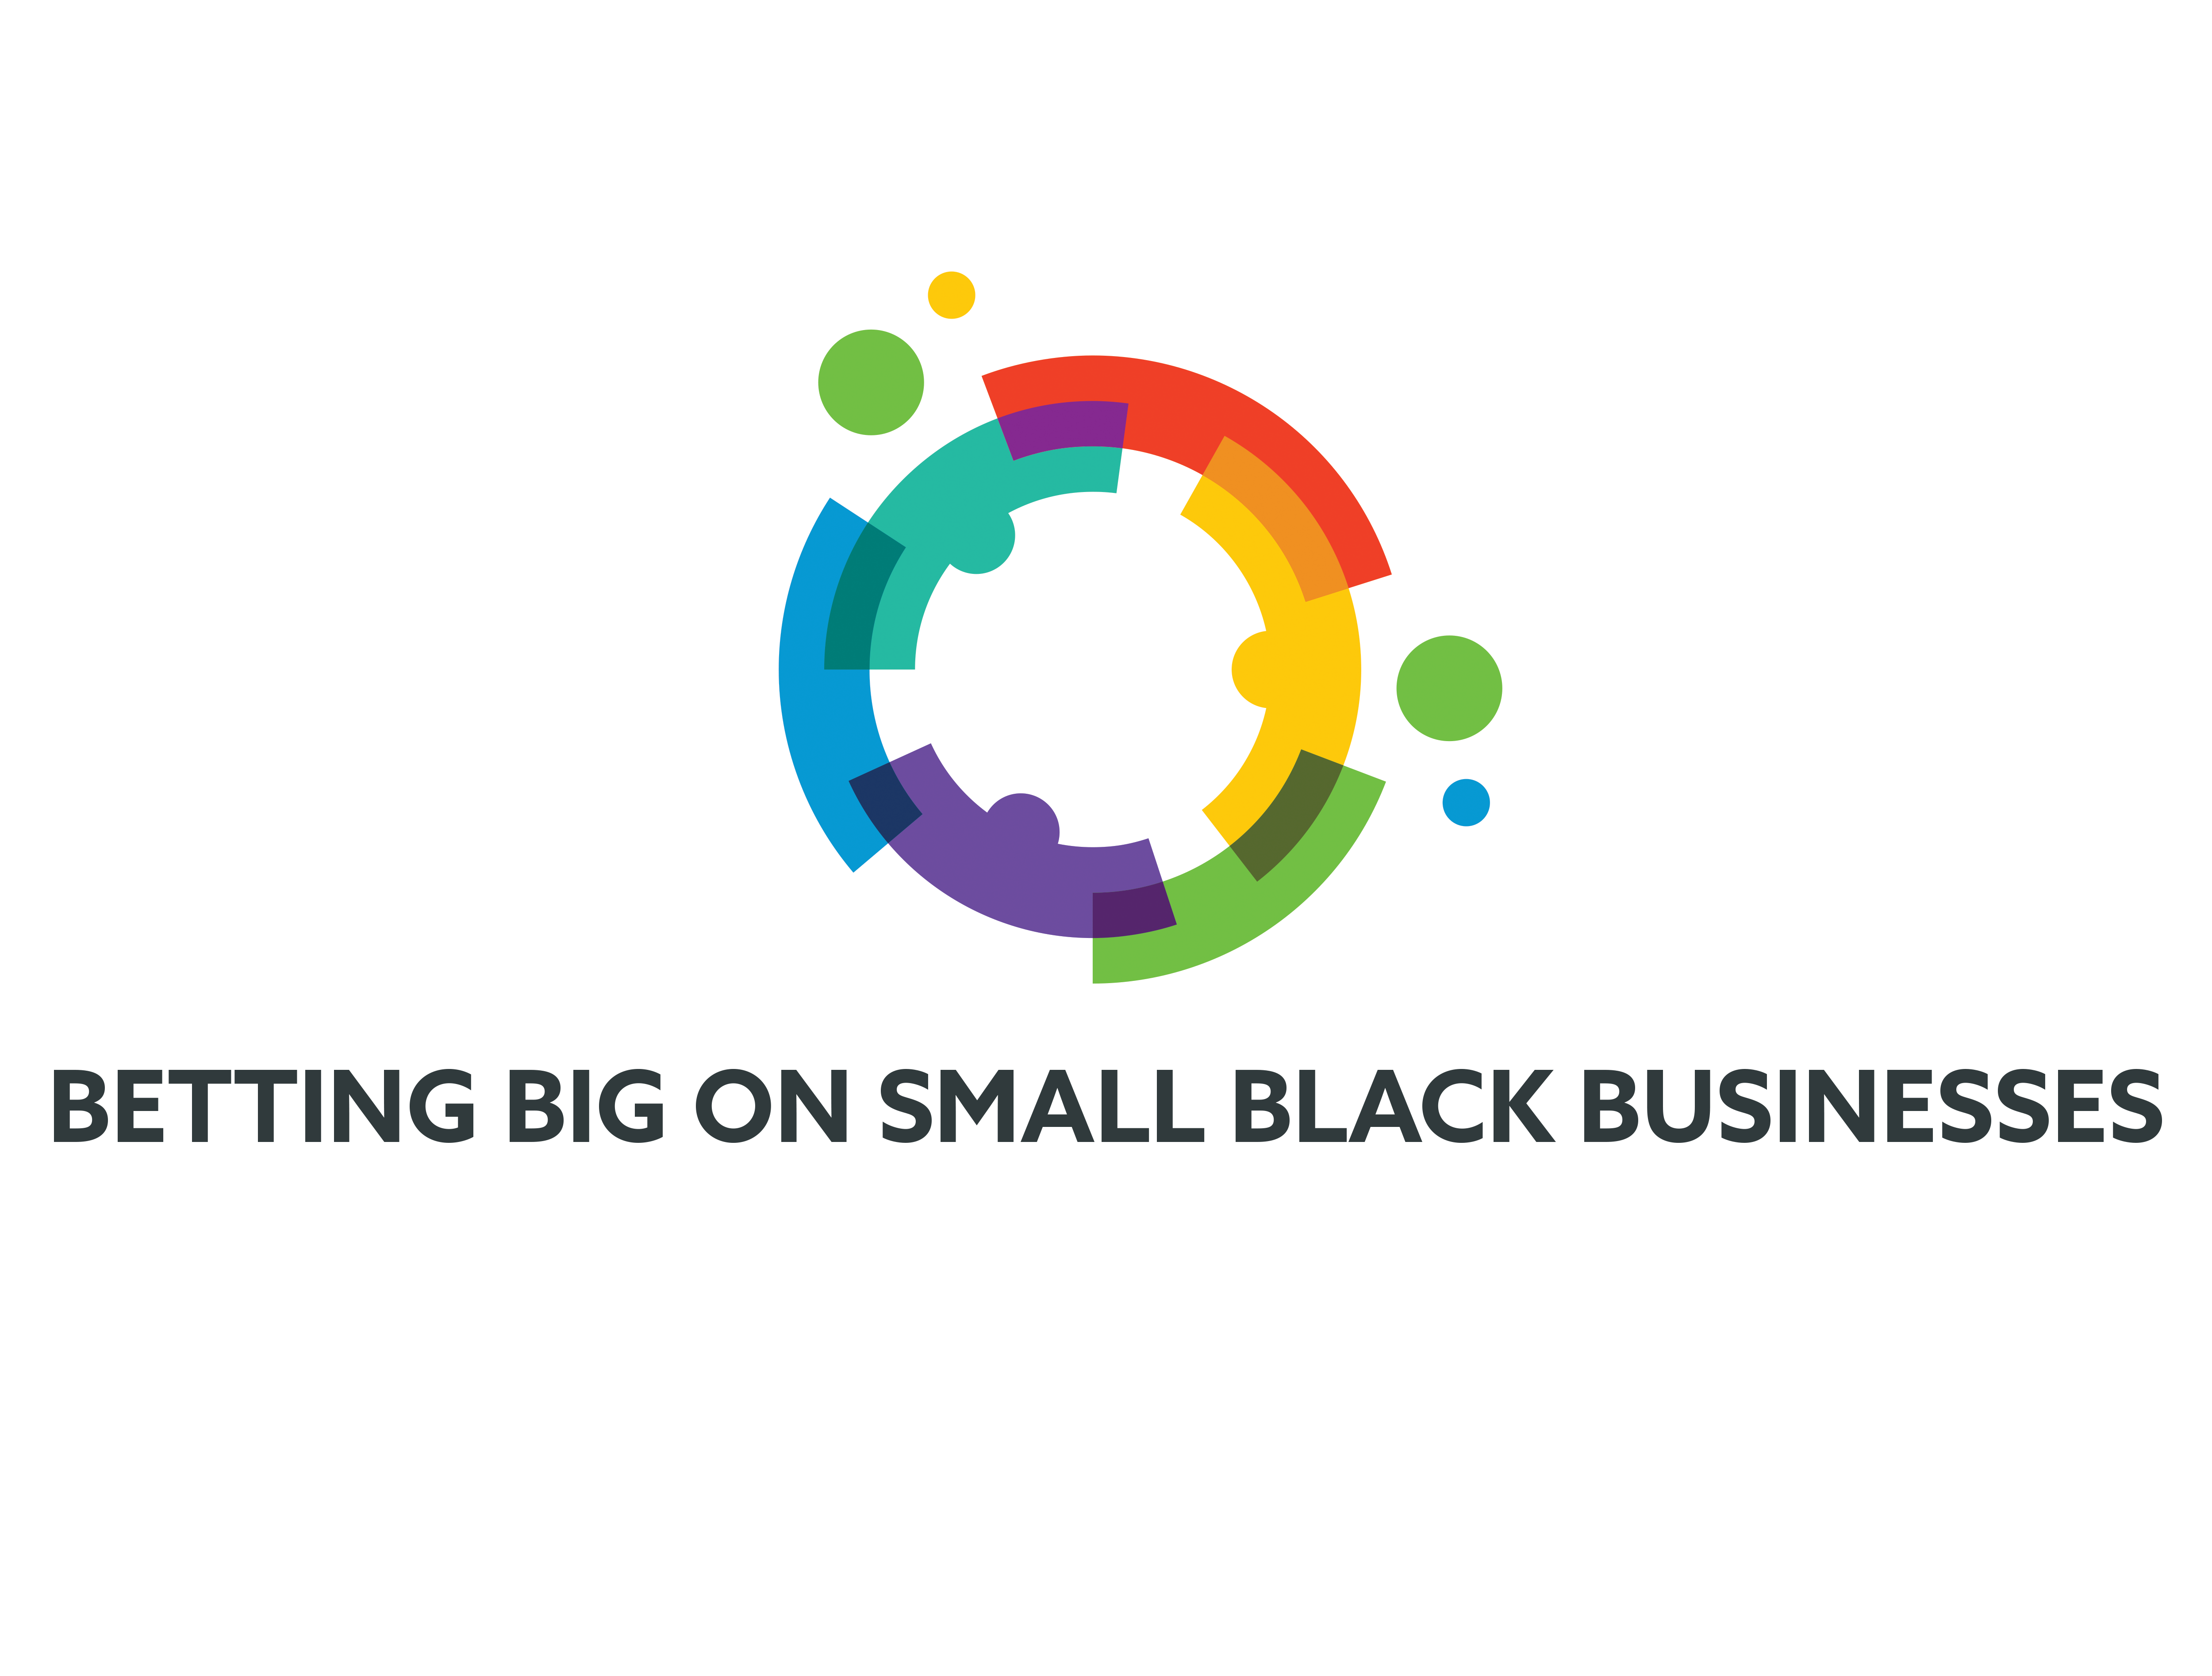 Betting Big on Small Black Businesses logo